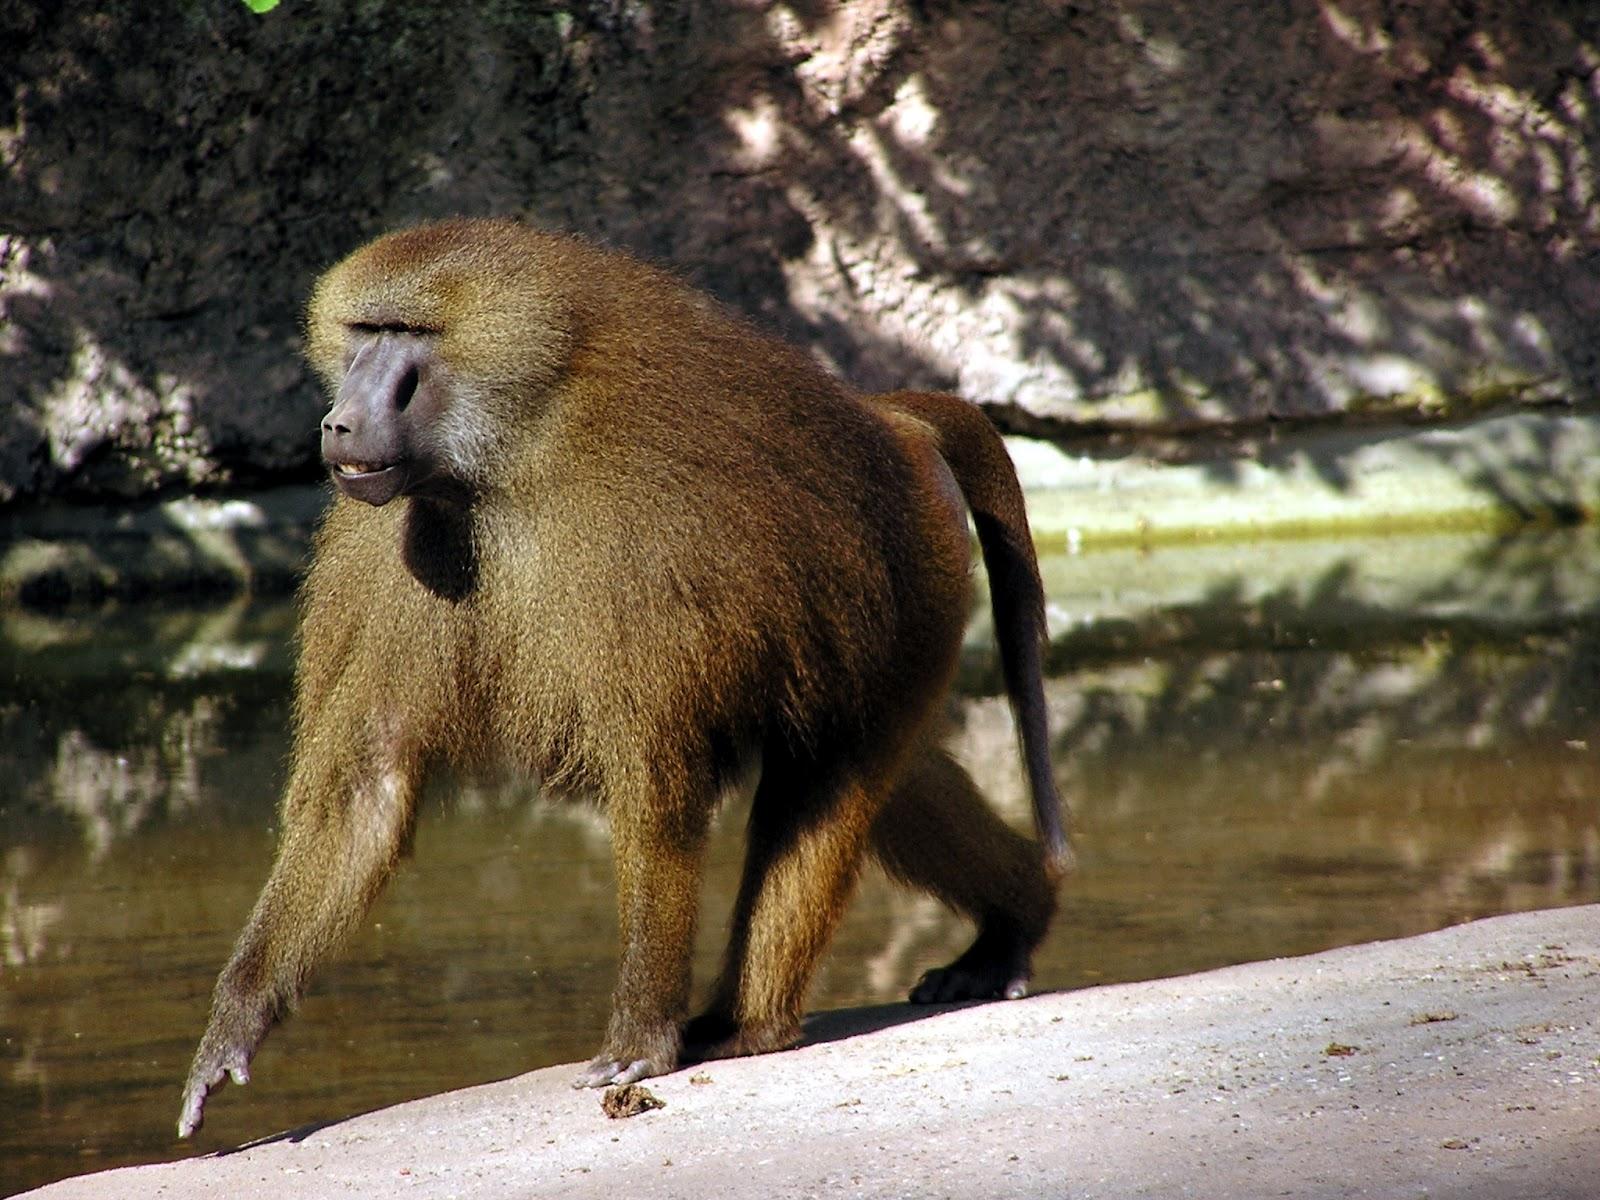 Baboon | The Biggest Animals Kingdom